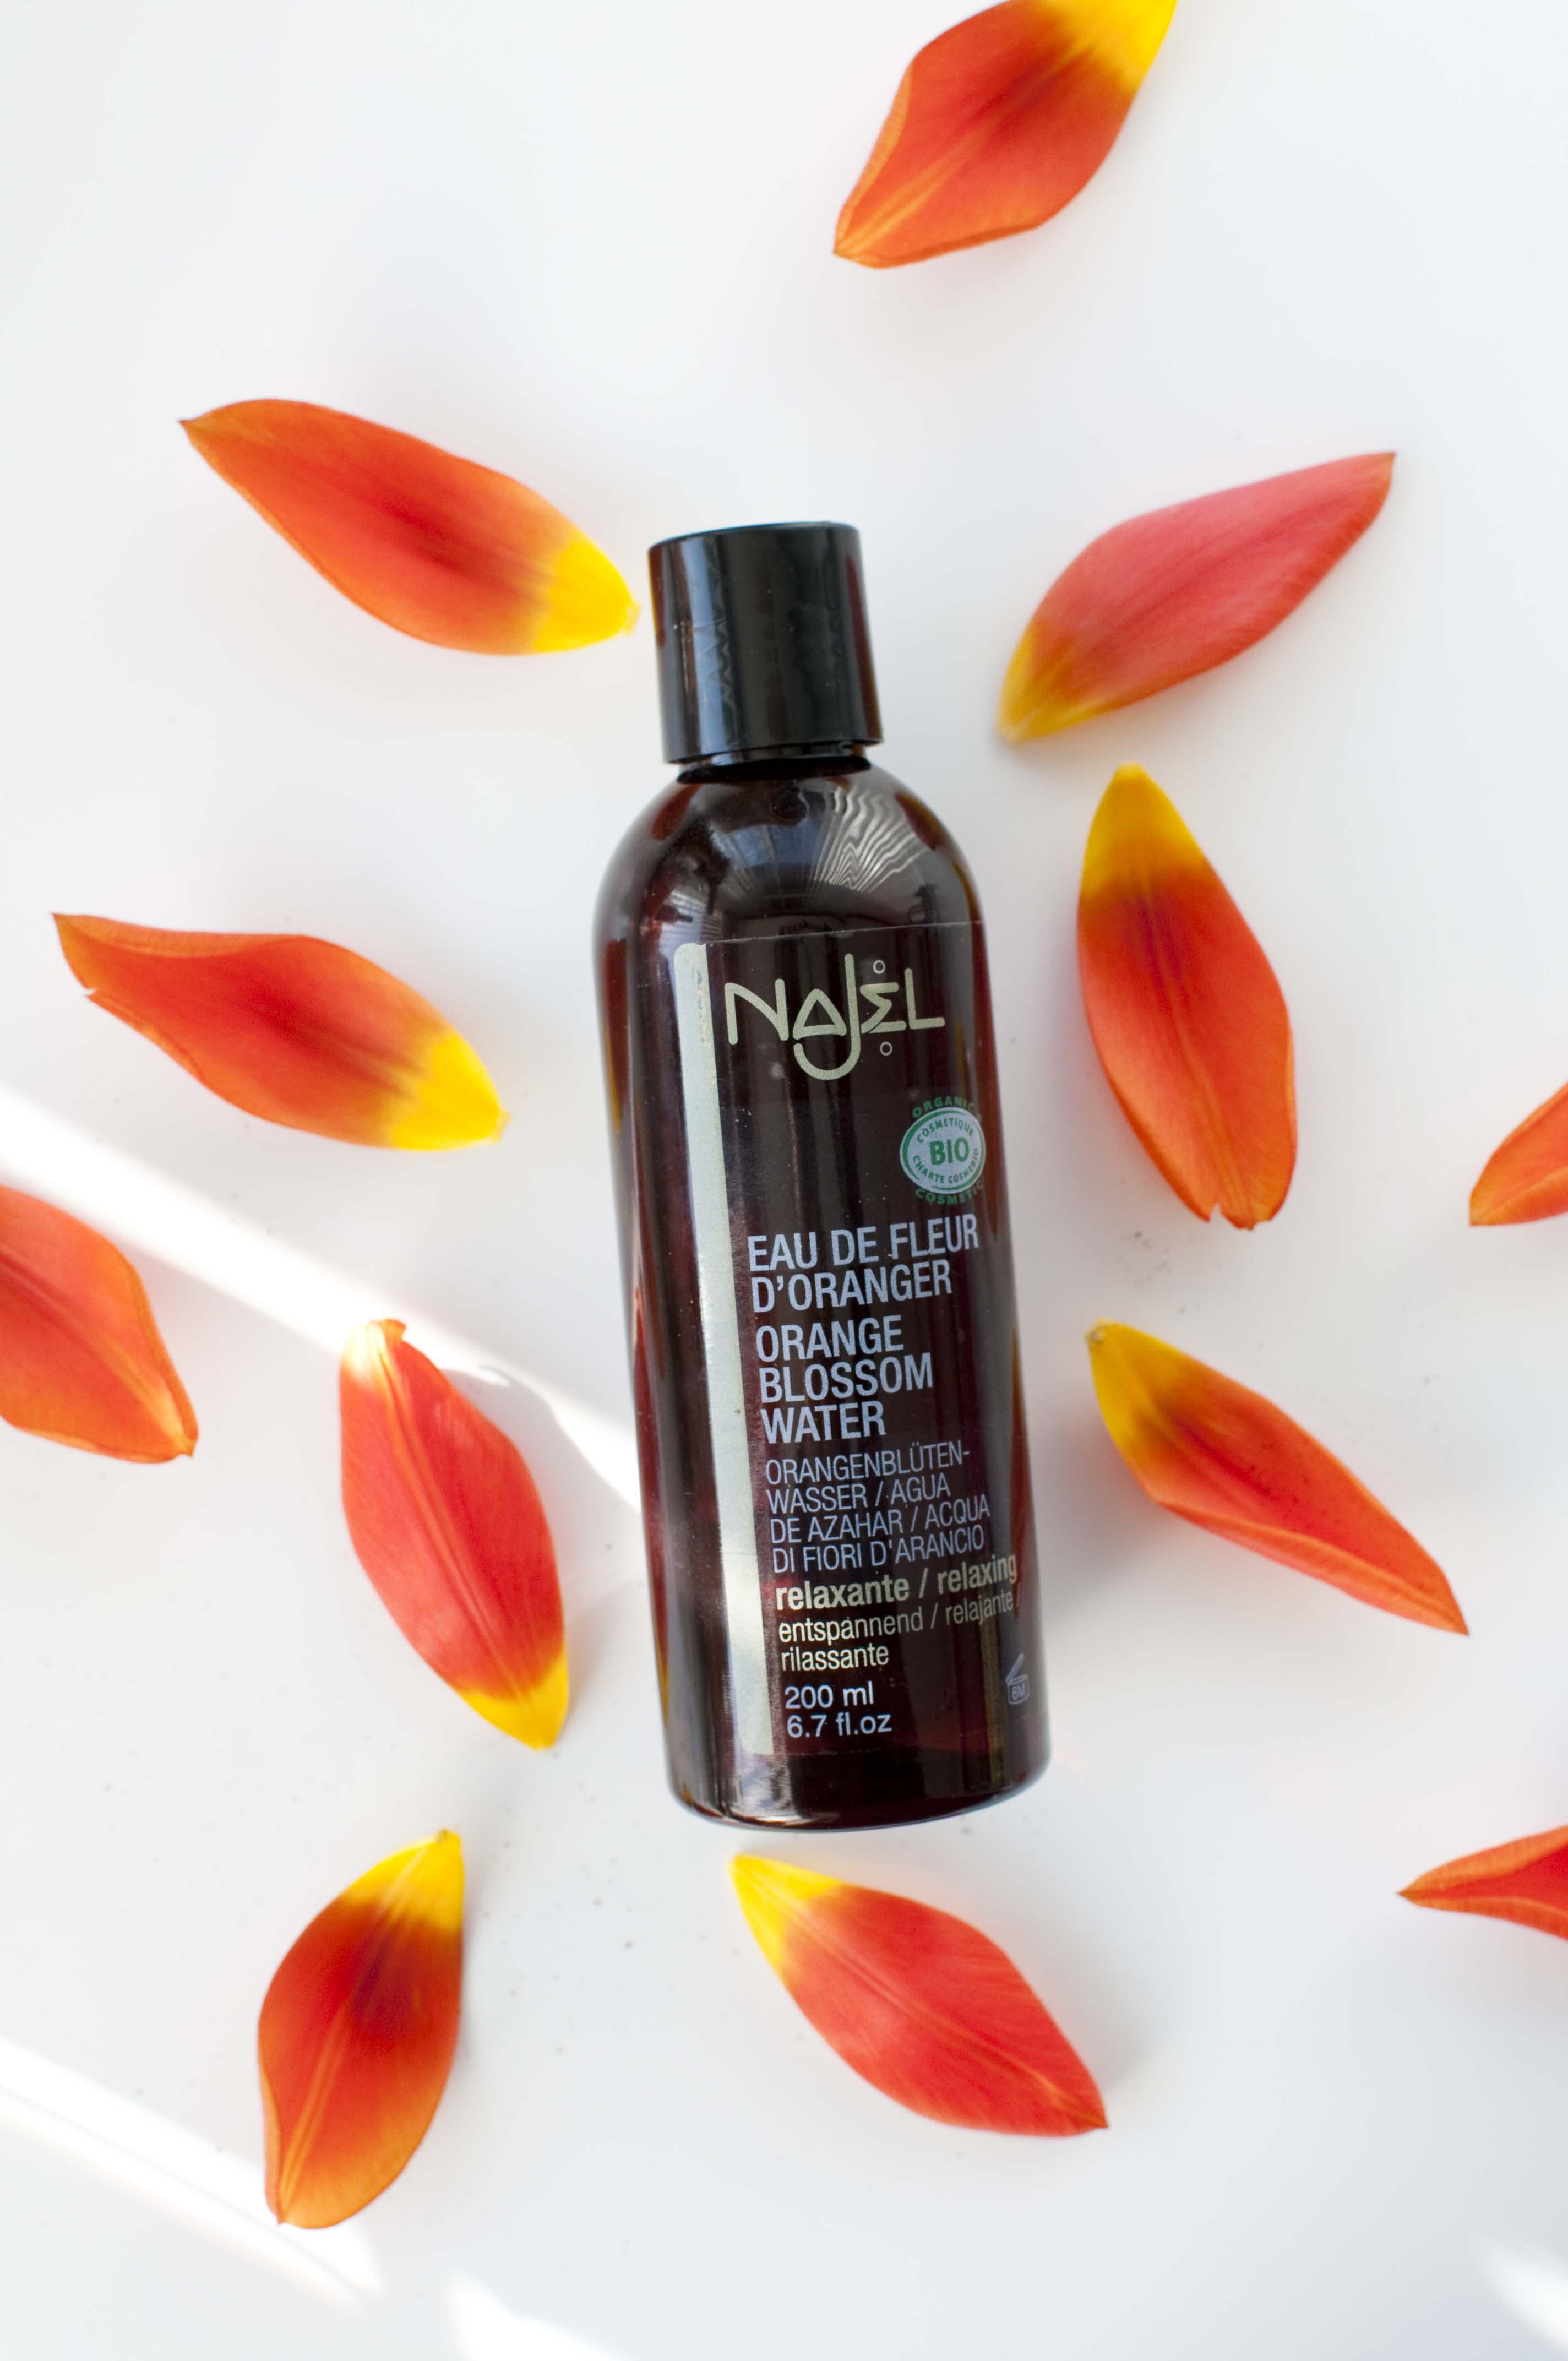 review Najel orange blossom water